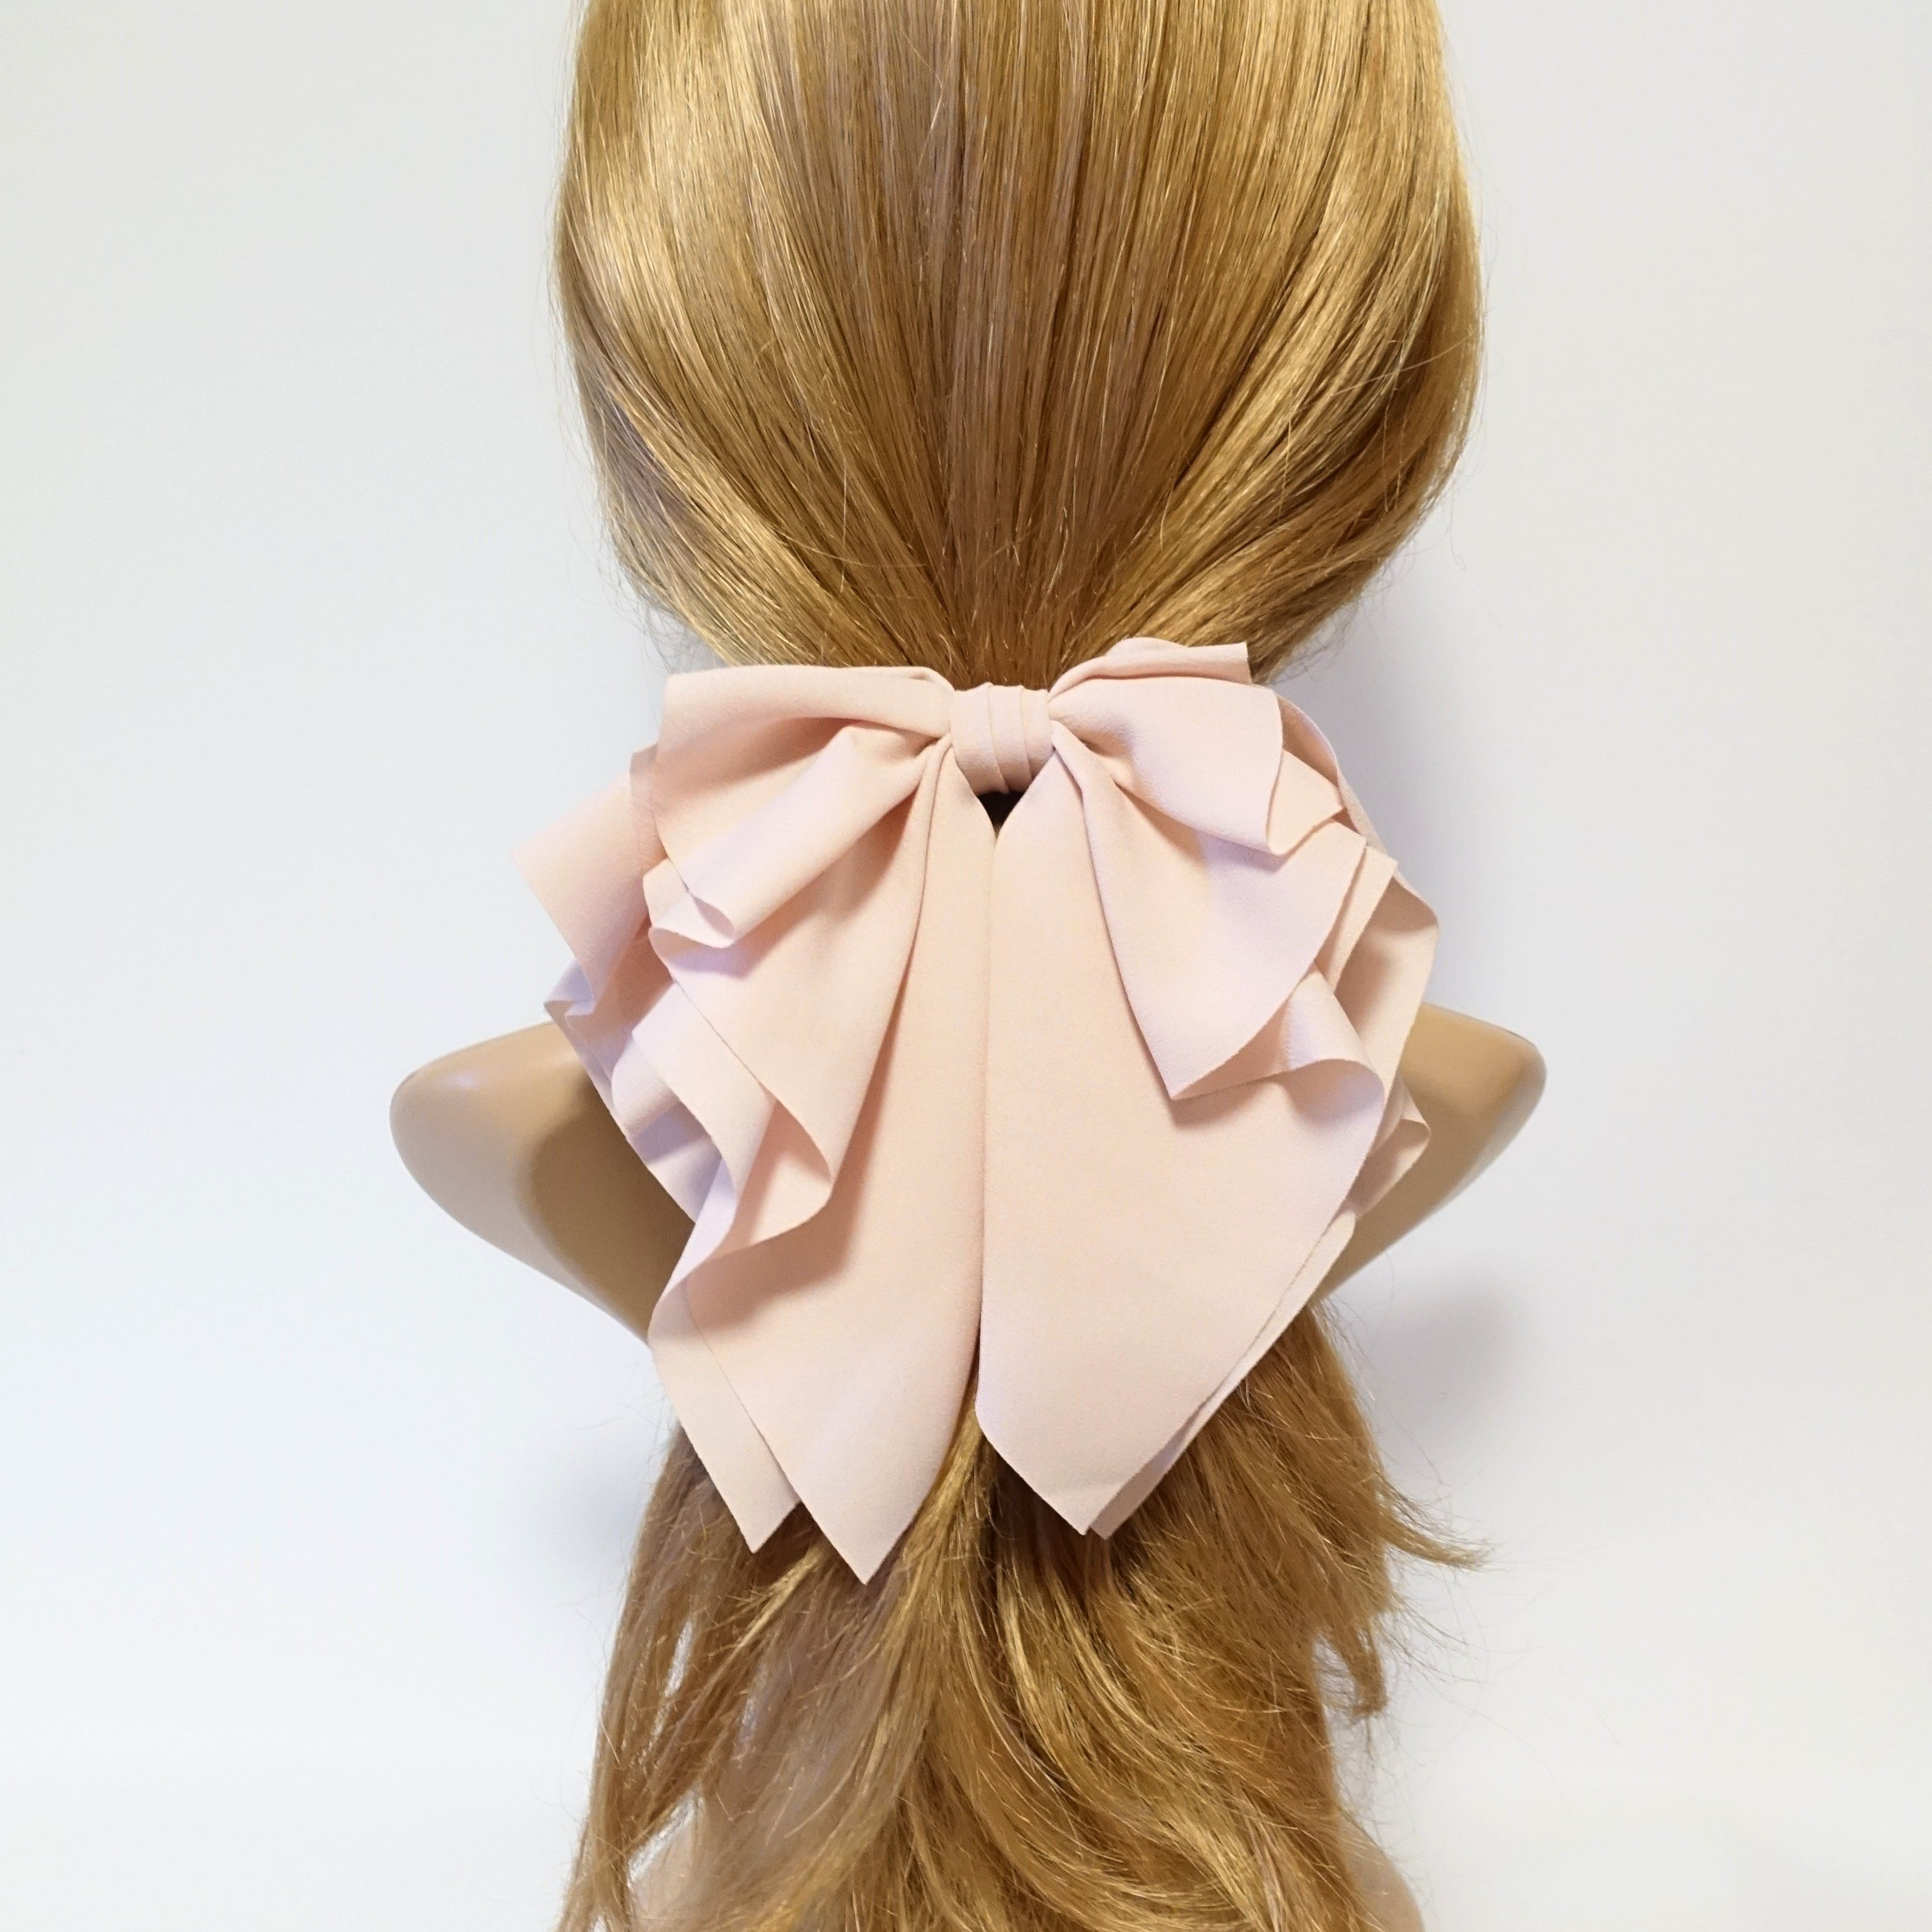 21 Feminine Ways To Wear The French Twist This Fall French Twist Hair Twist Ponytail Hair Do For Medium Hair